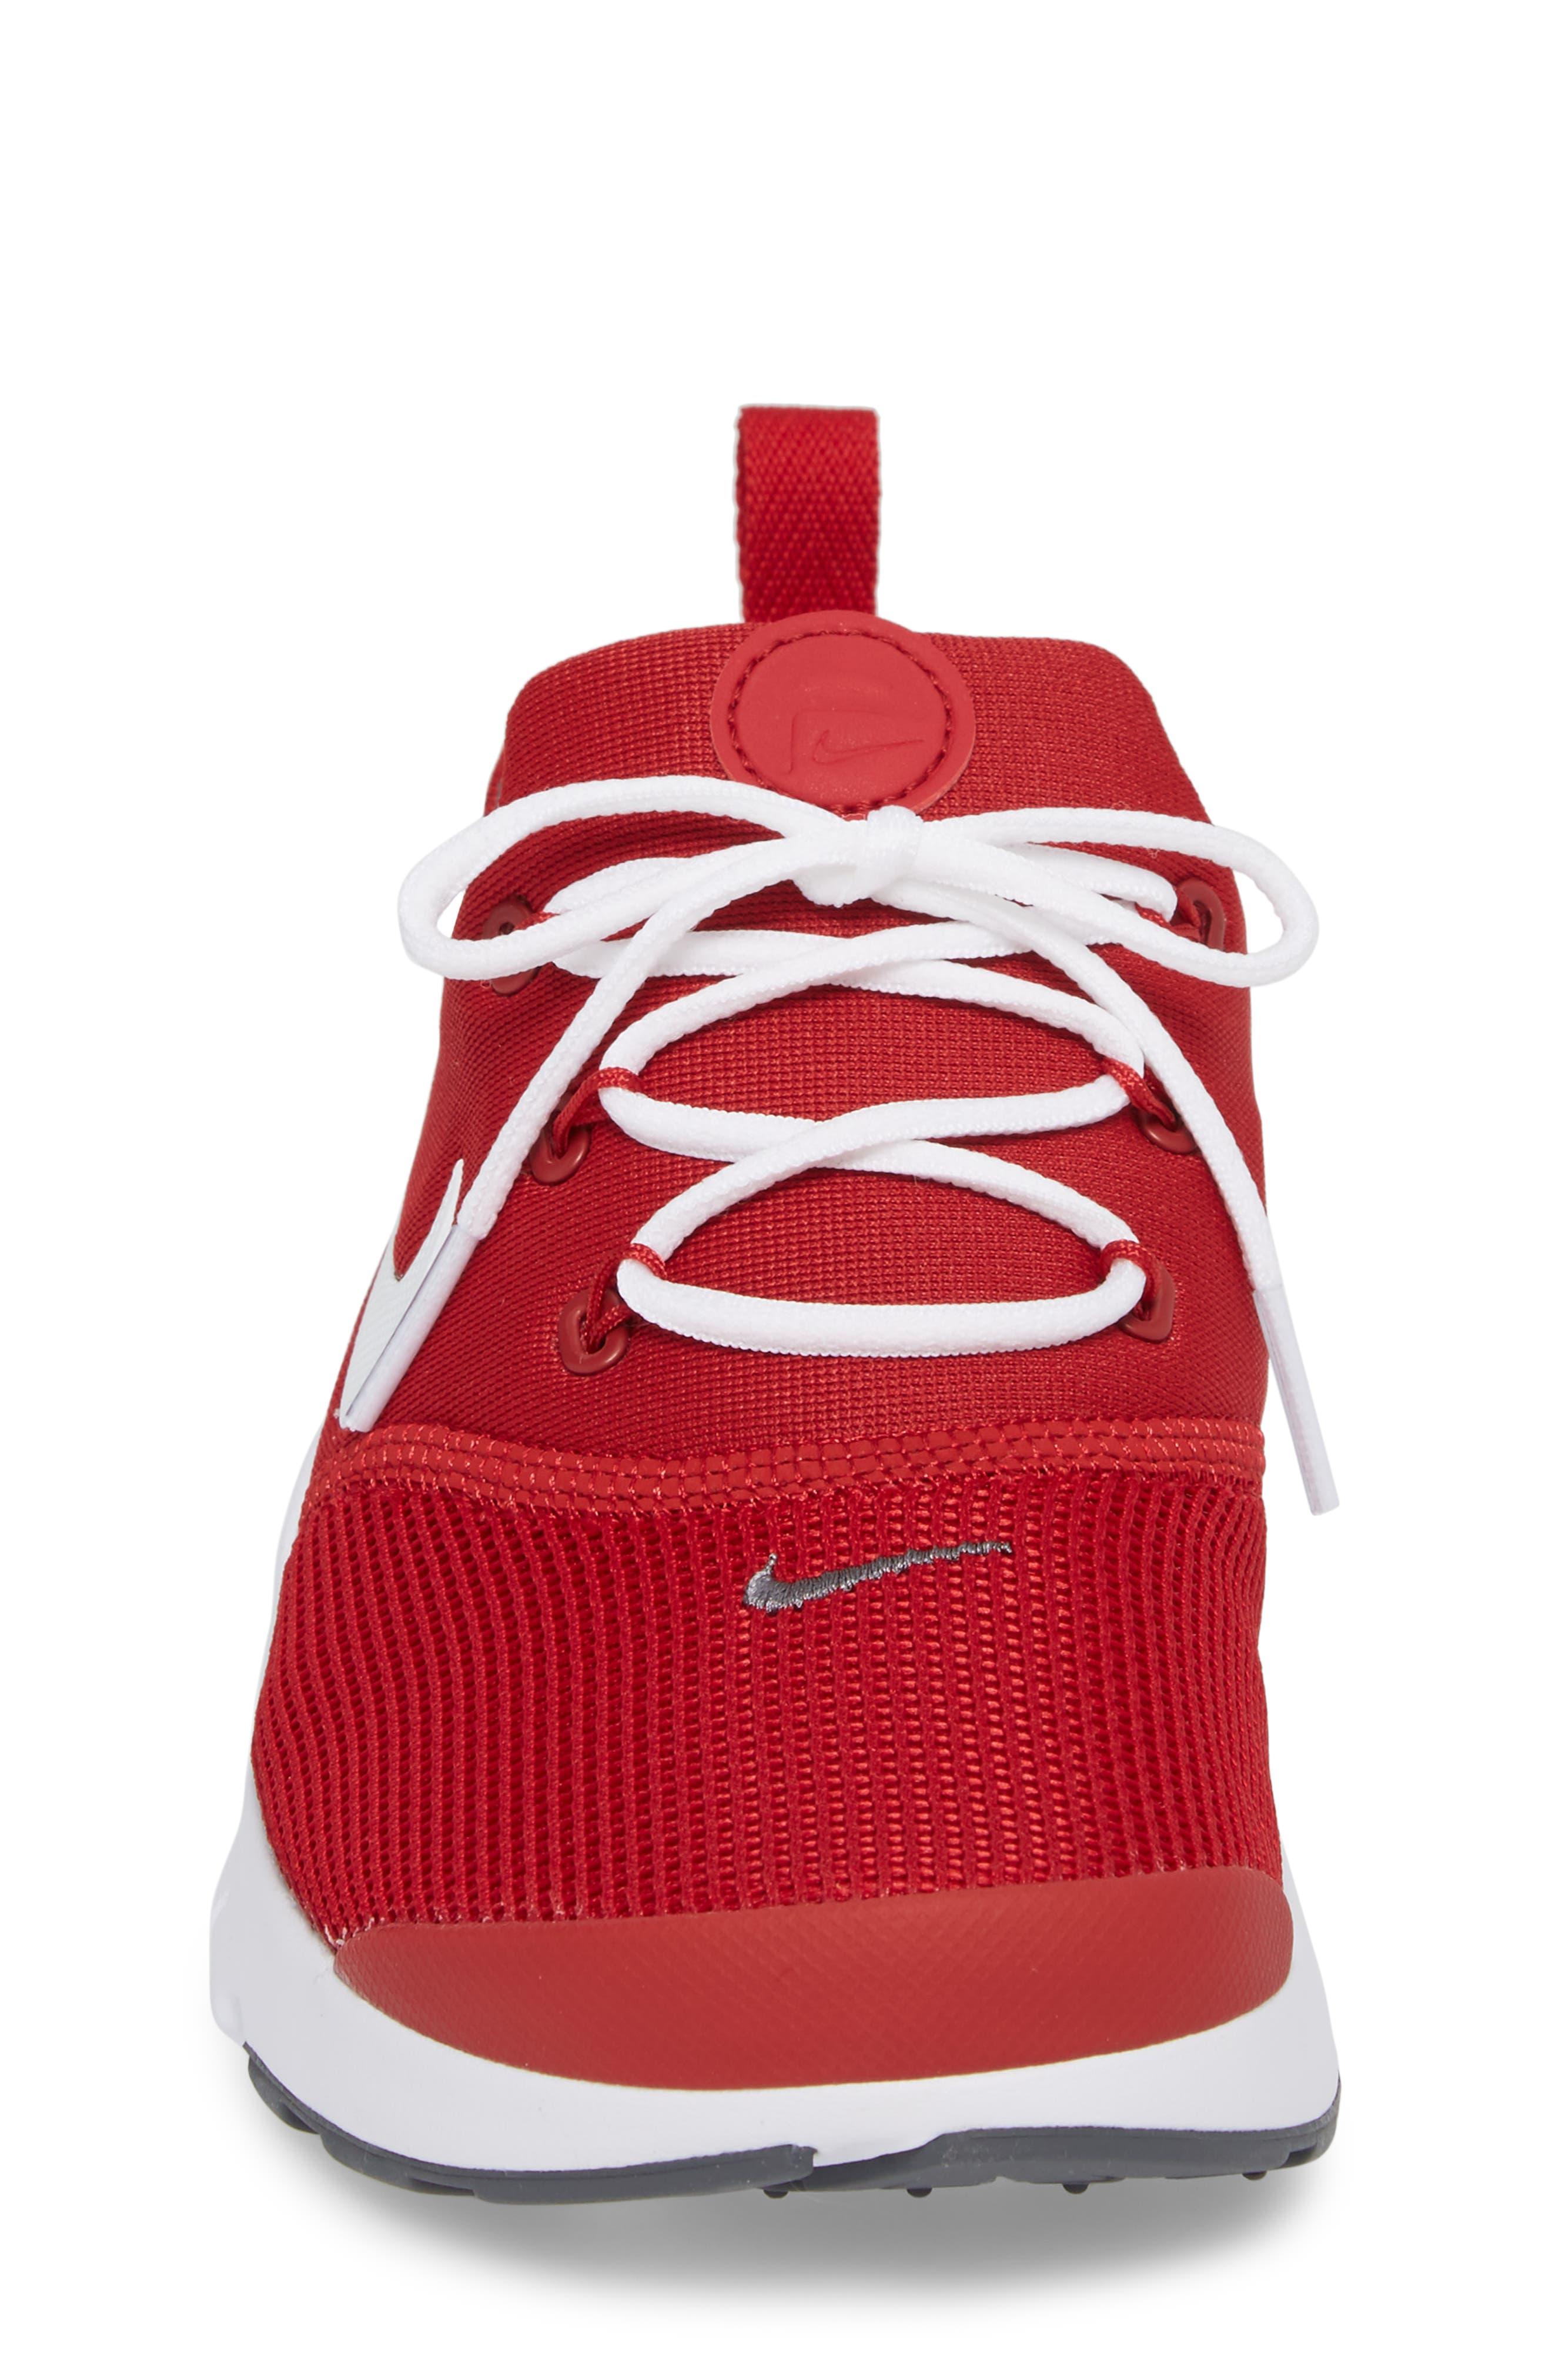 Presto Fly Sneaker,                             Alternate thumbnail 4, color,                             Gym Red/ Dark Grey/ White